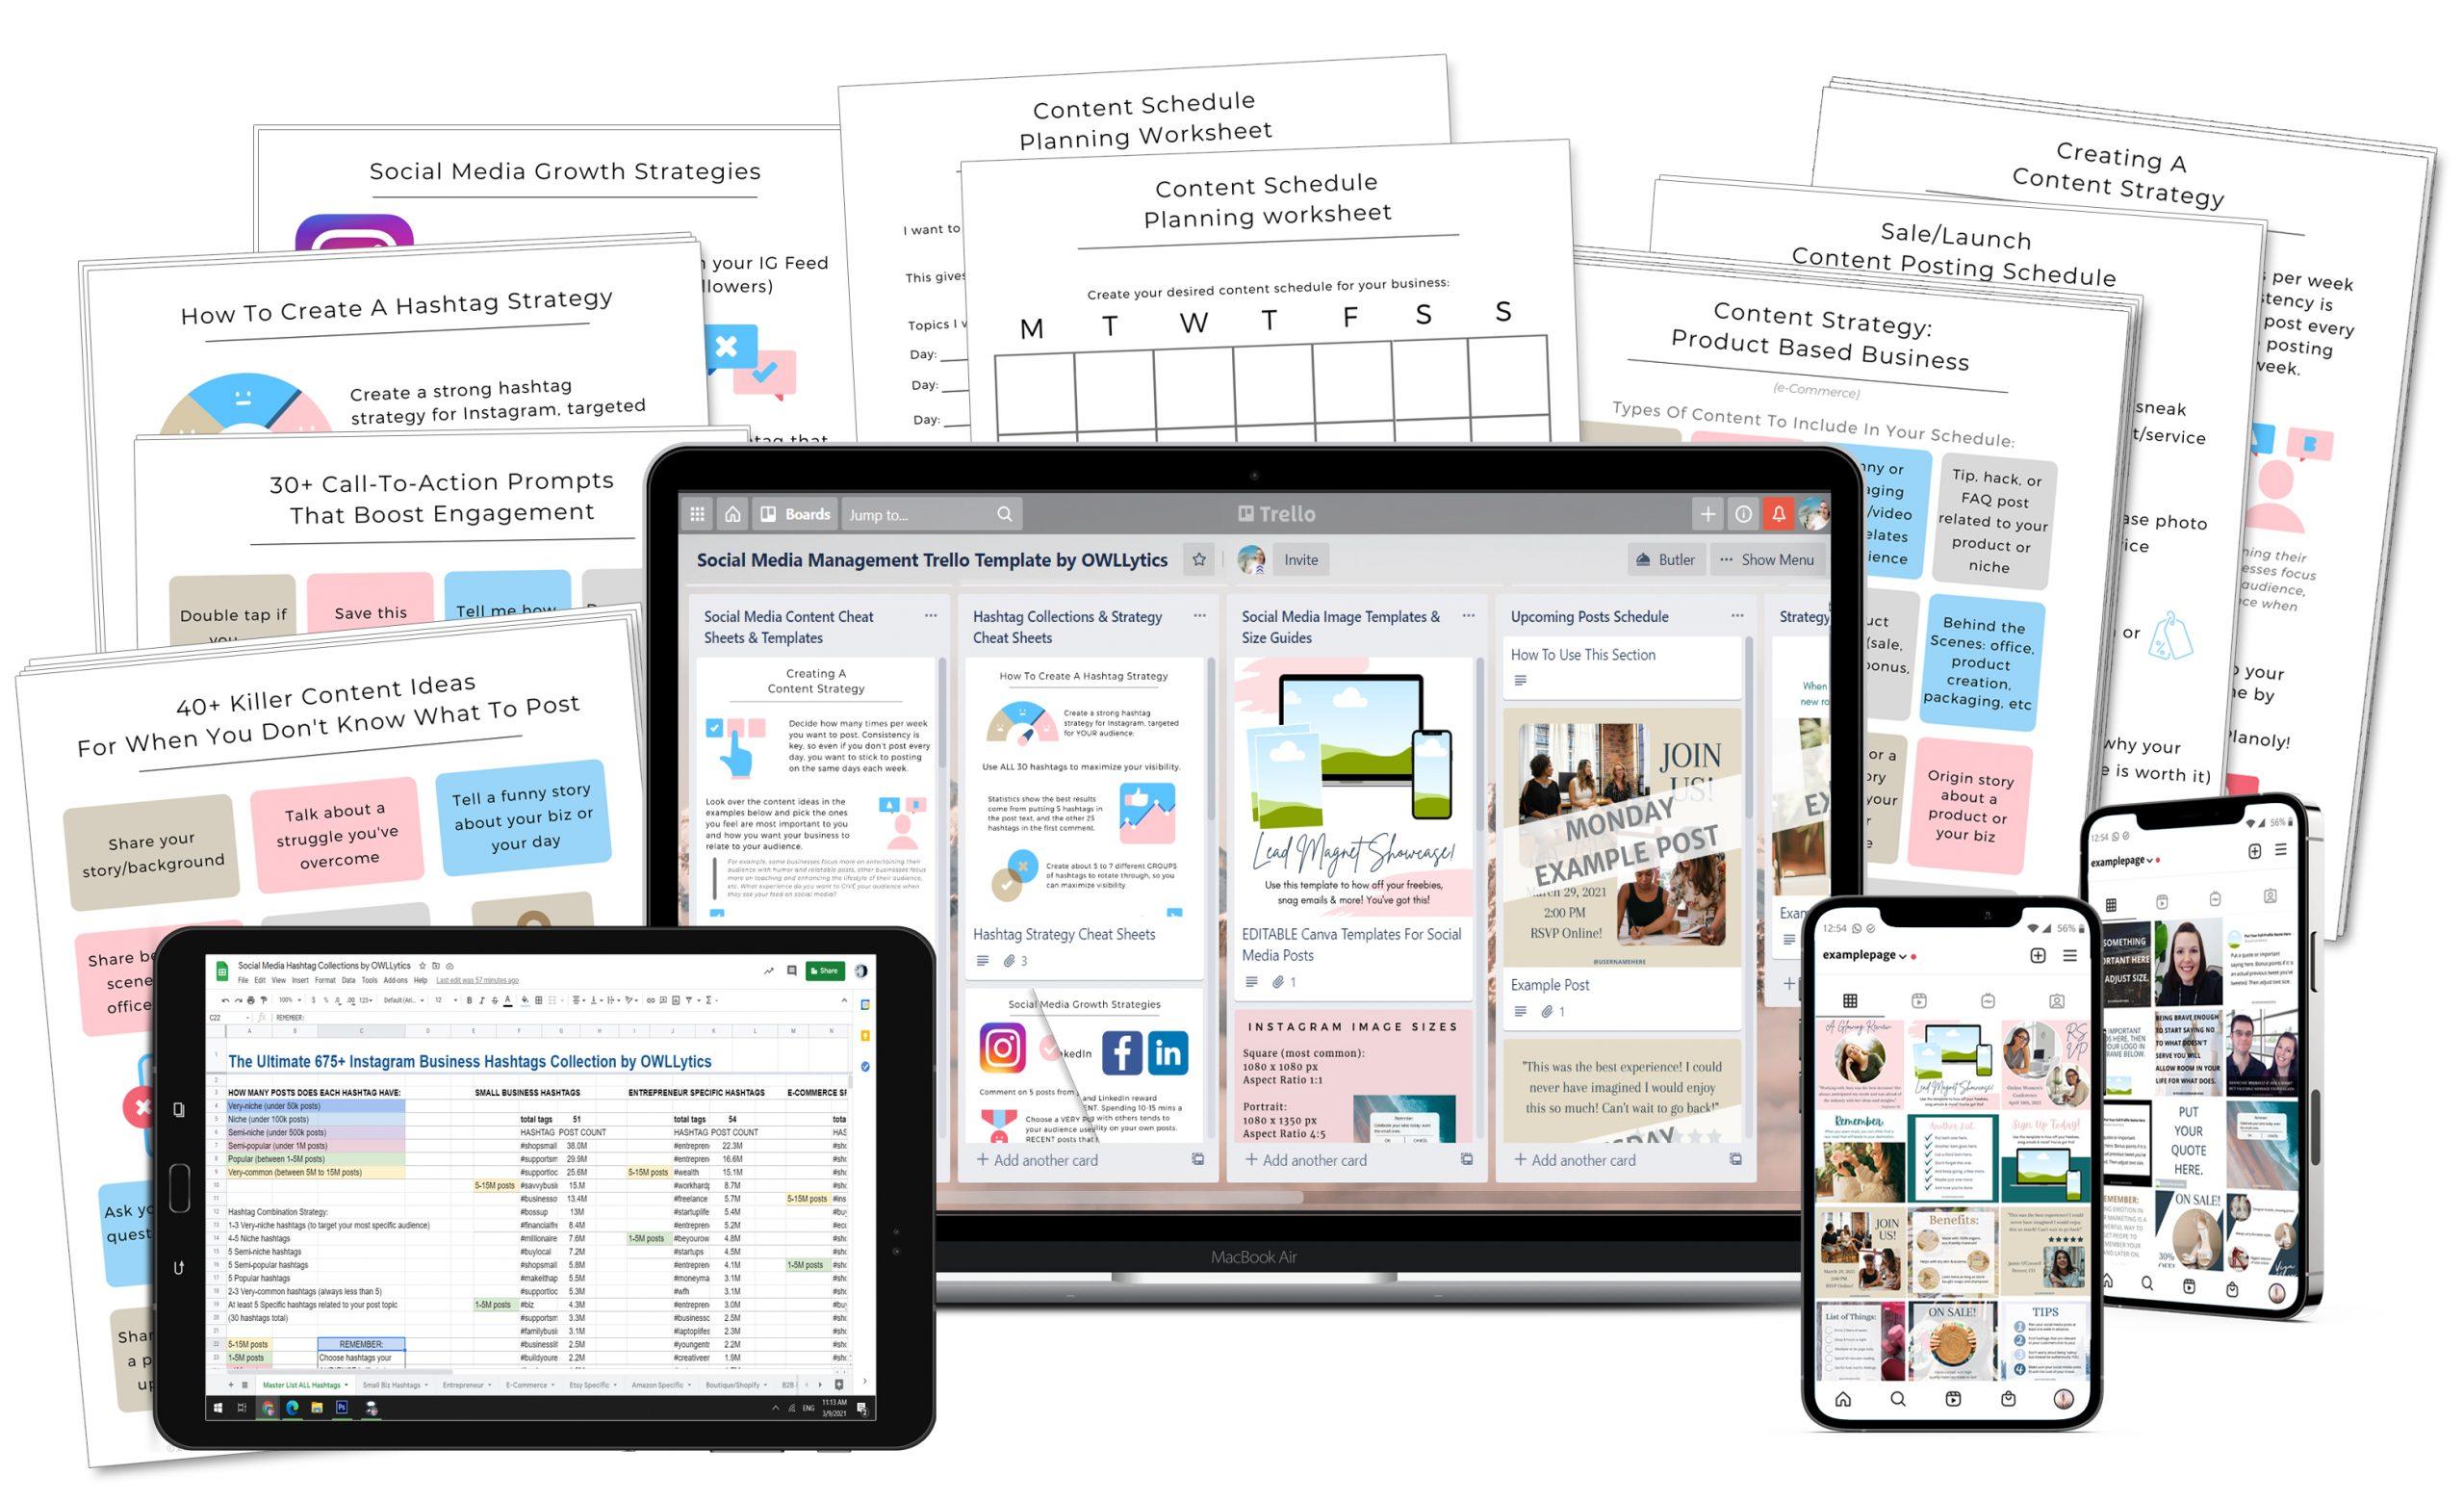 The Social Media Management Success Kit by OWLLytics